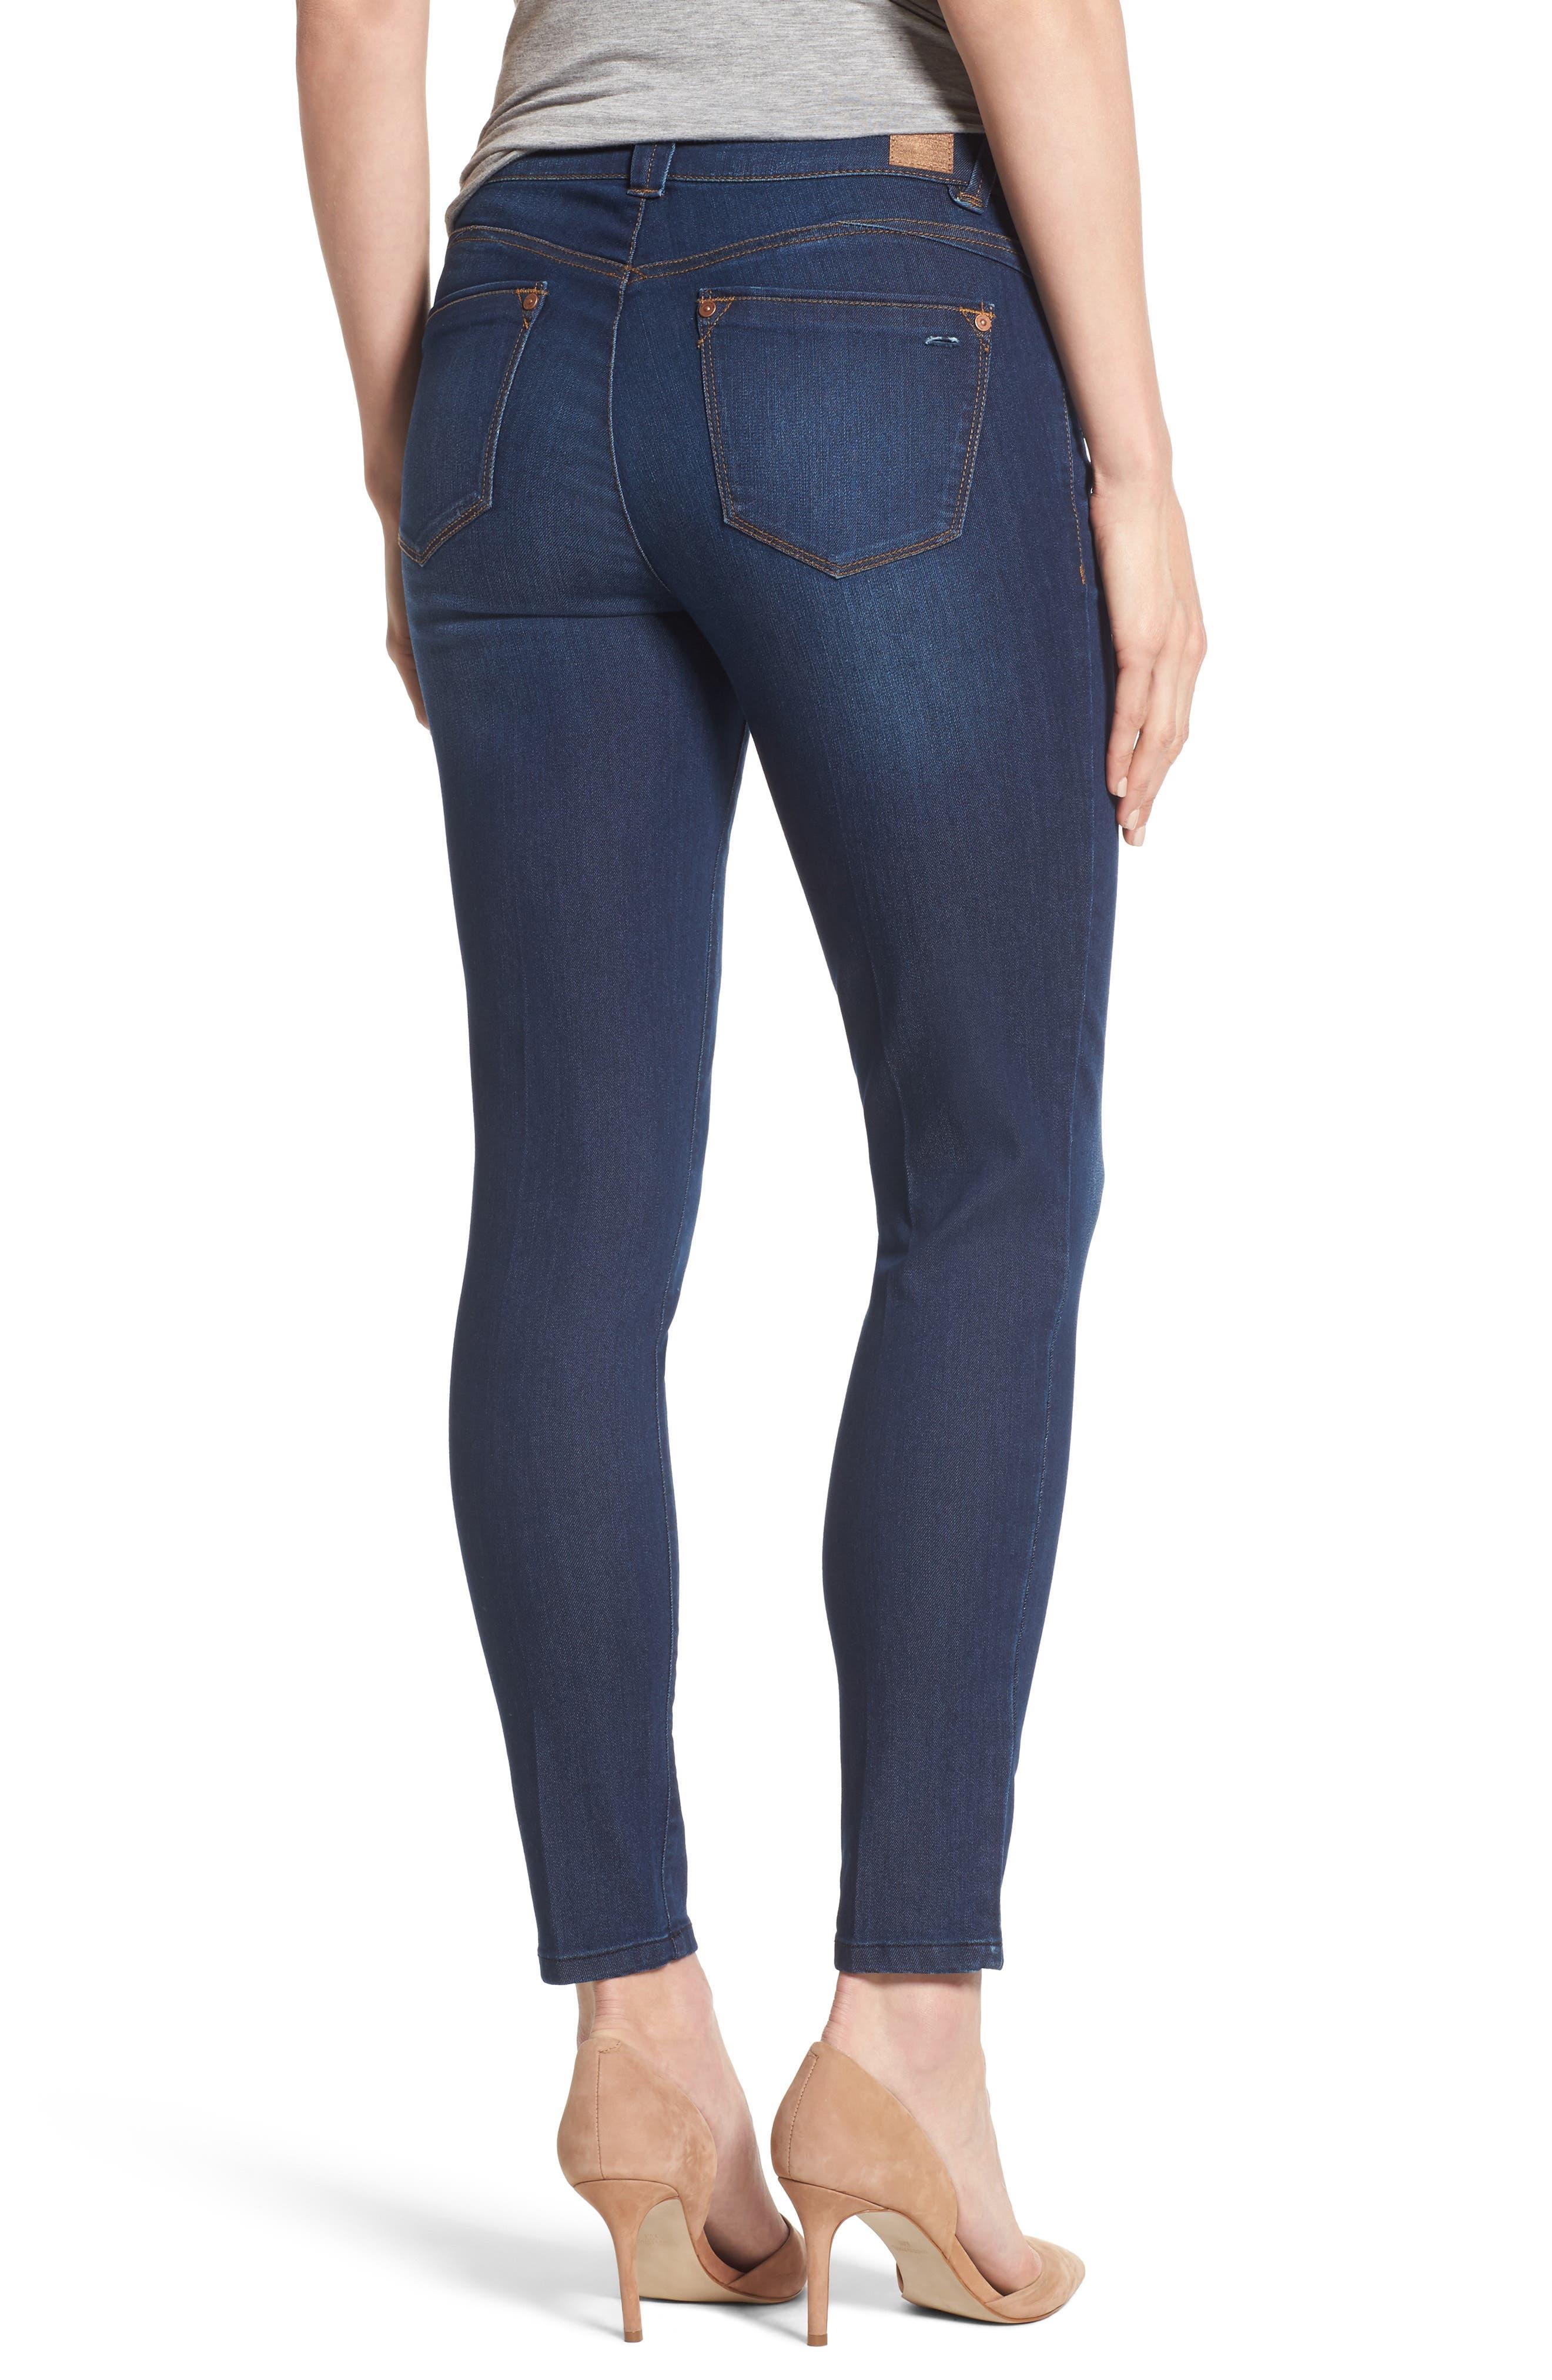 Alternate Image 2  - Wit & Wisdom Skinny Ankle Jeans (Nordstrom Exclusive) (Regular & Petite)